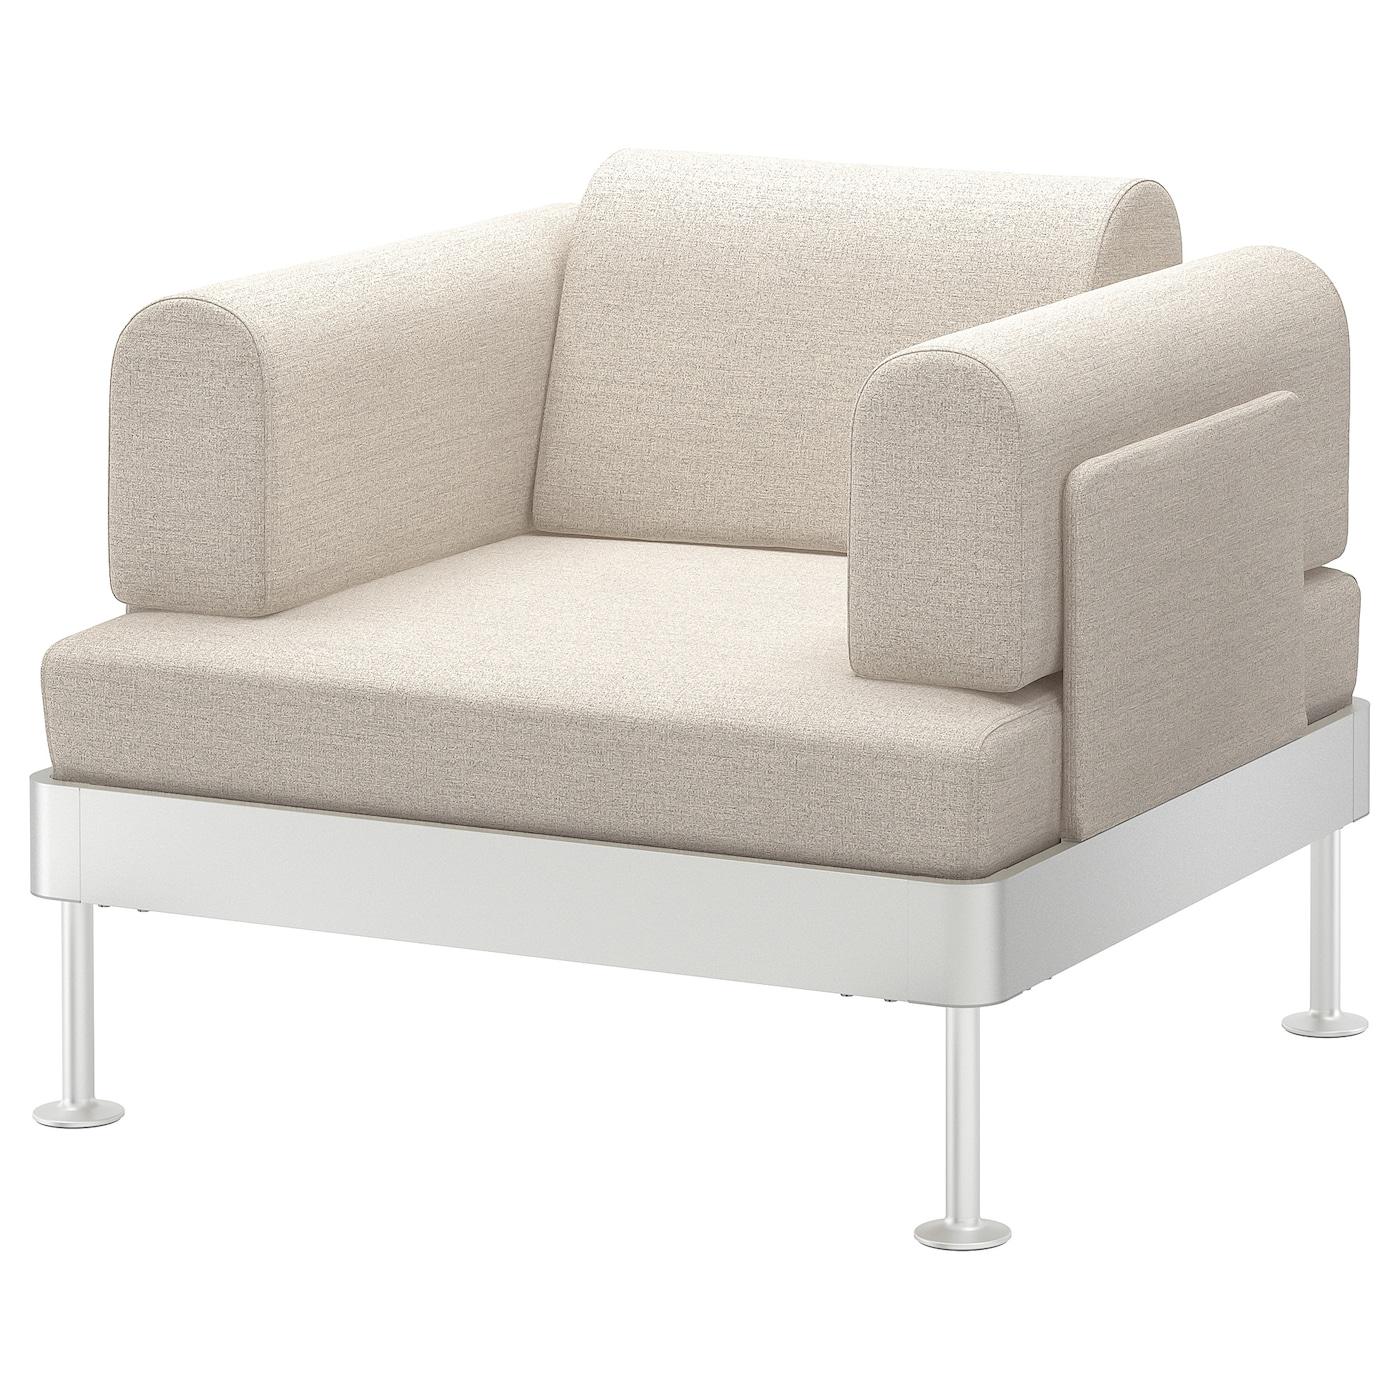 tig-armchair-gunnared-beige__0668331_PE714367_S5